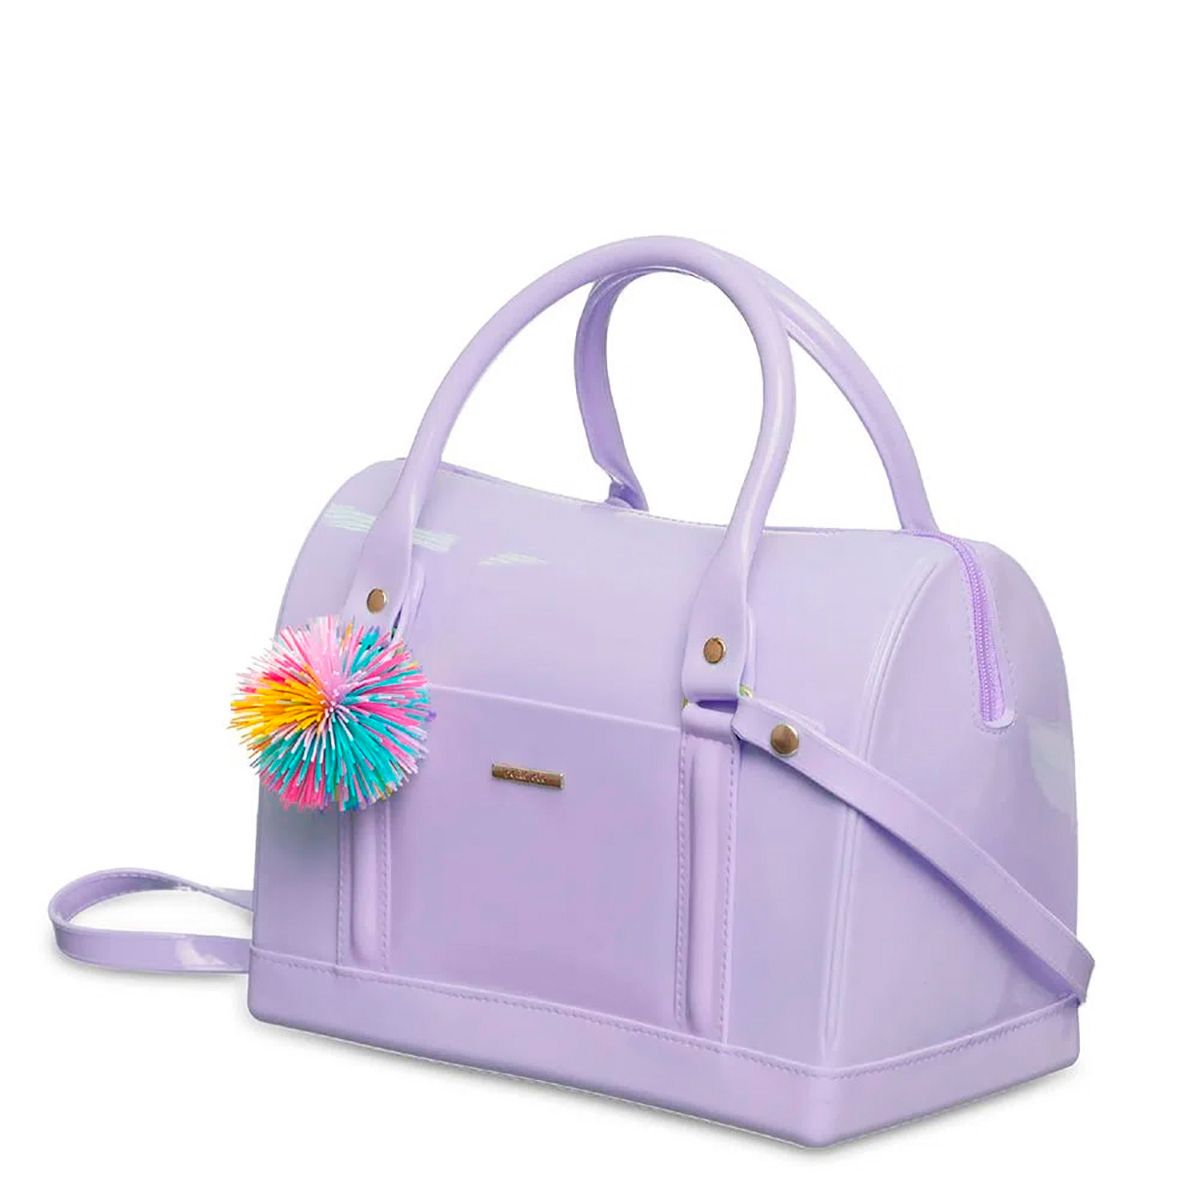 Bolsa Petite Jolie PJ10320 Bloom